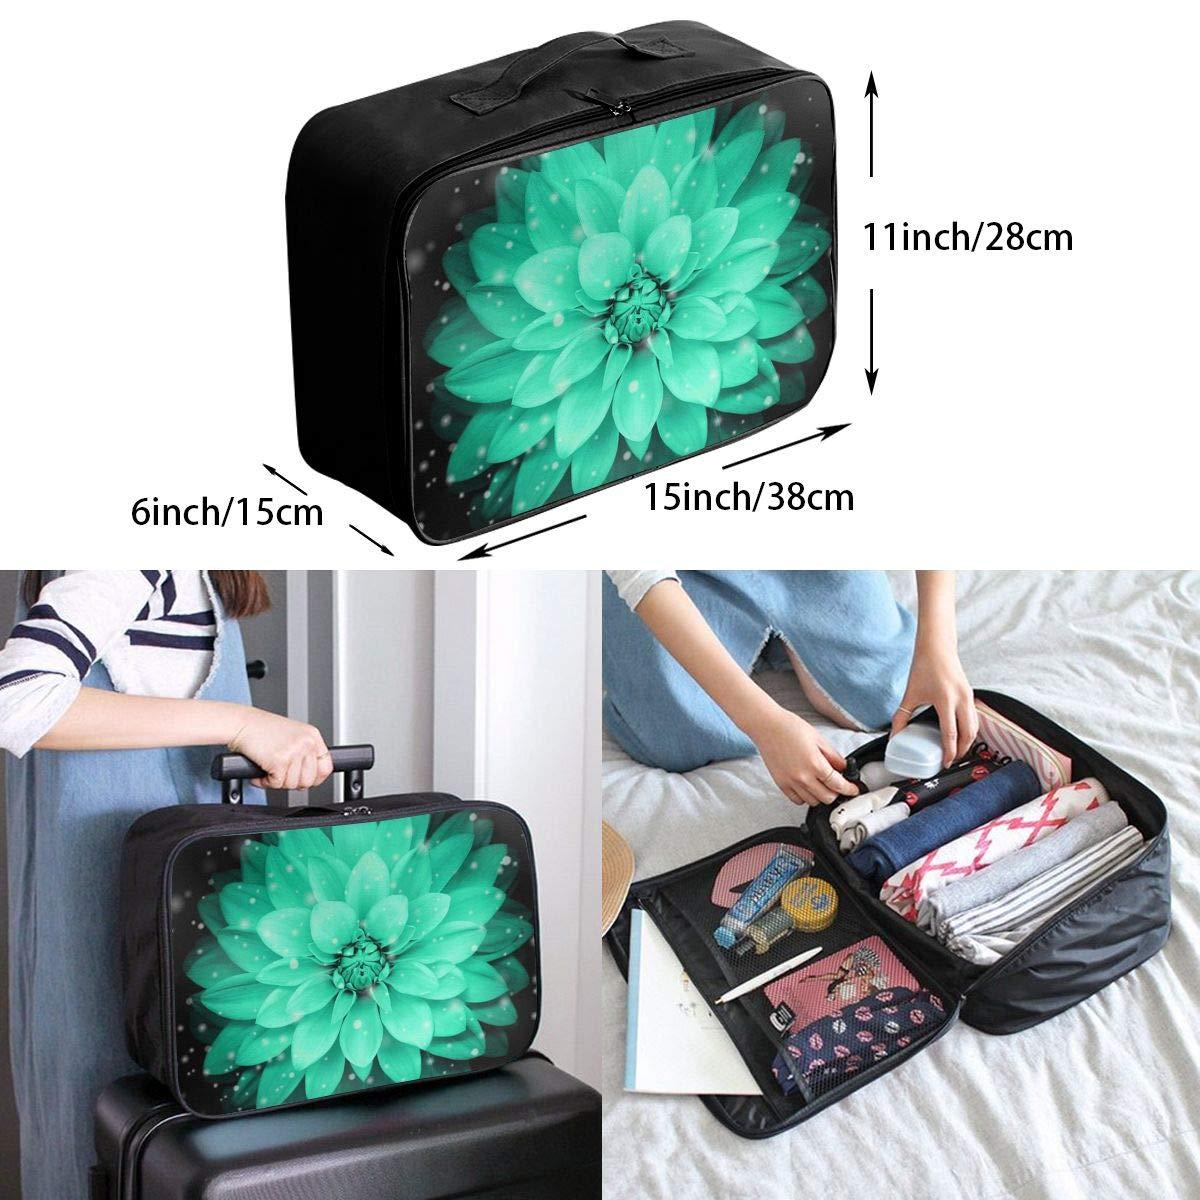 Travel Luggage Duffle Bag Lightweight Portable Handbag Green Flowers Pattern Large Capacity Waterproof Foldable Storage Tote